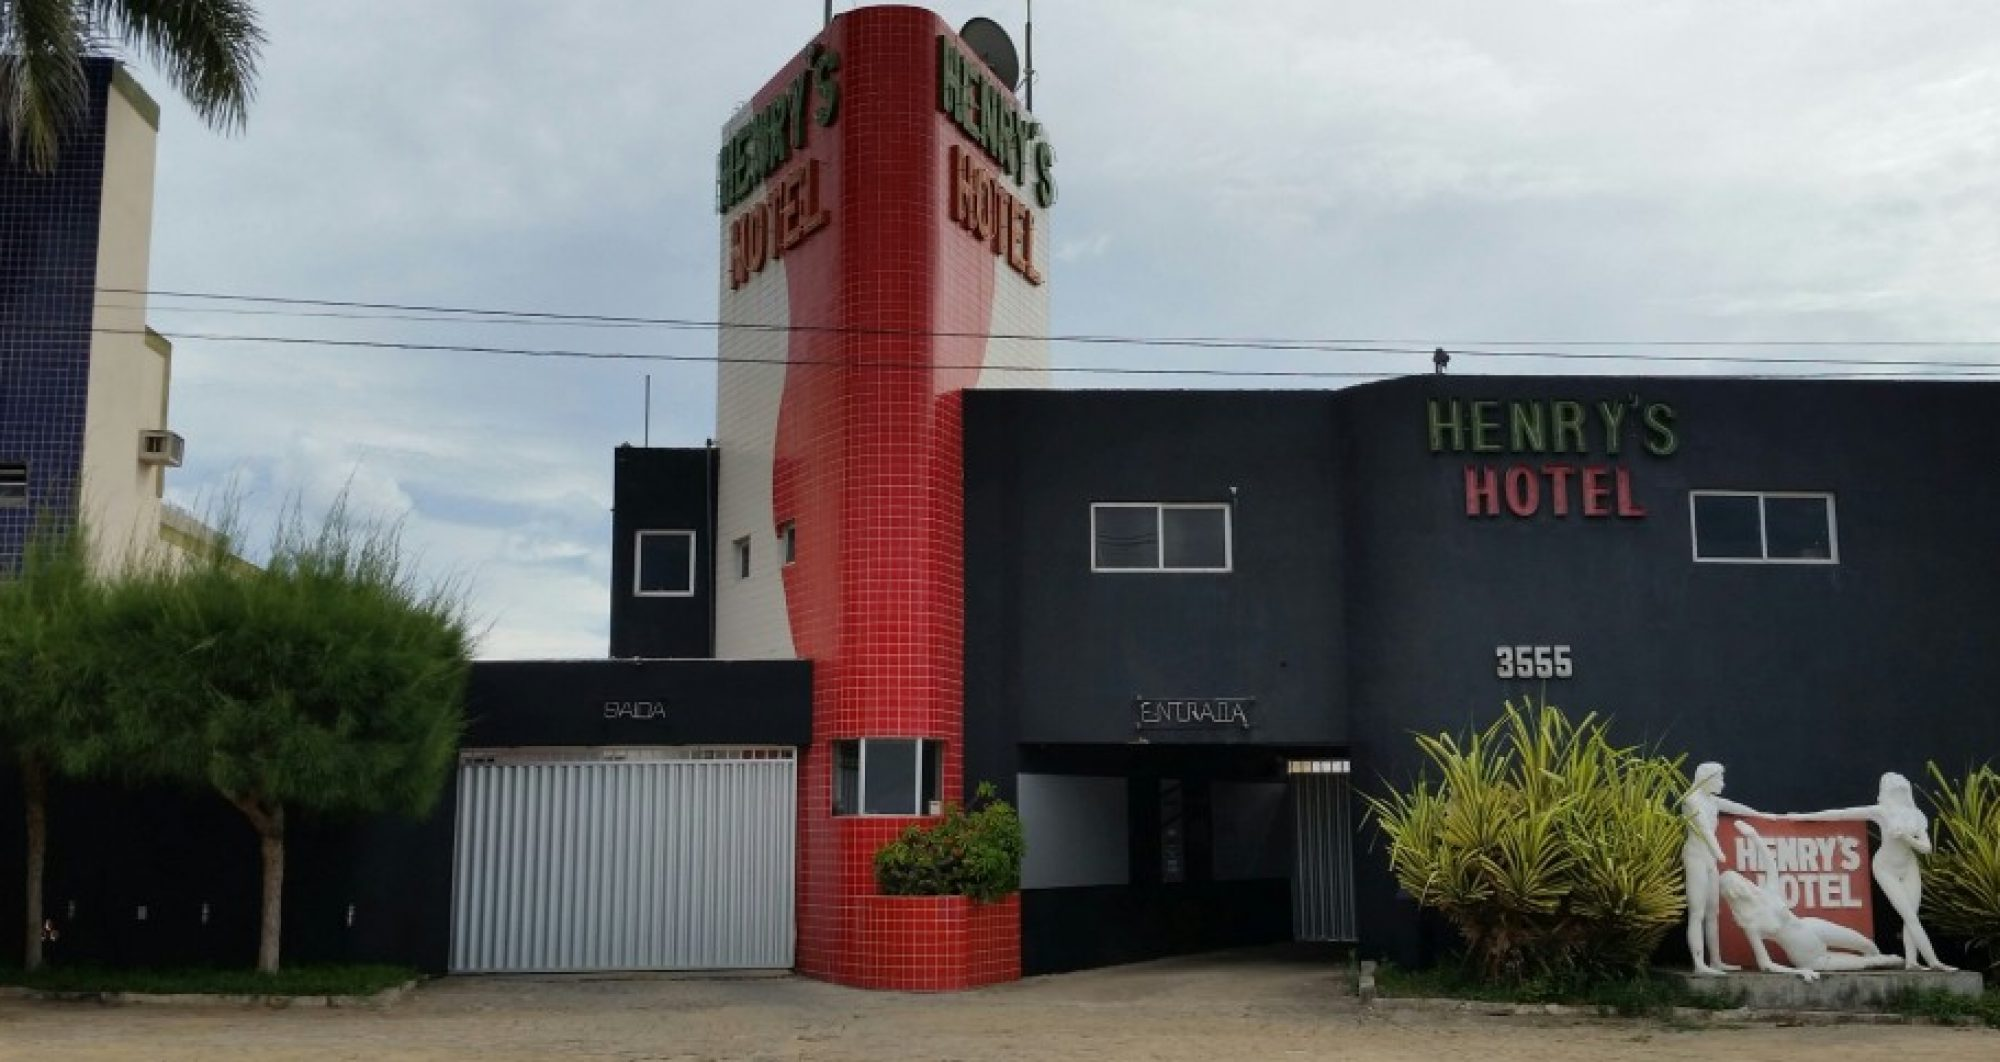 Henry's Hotel